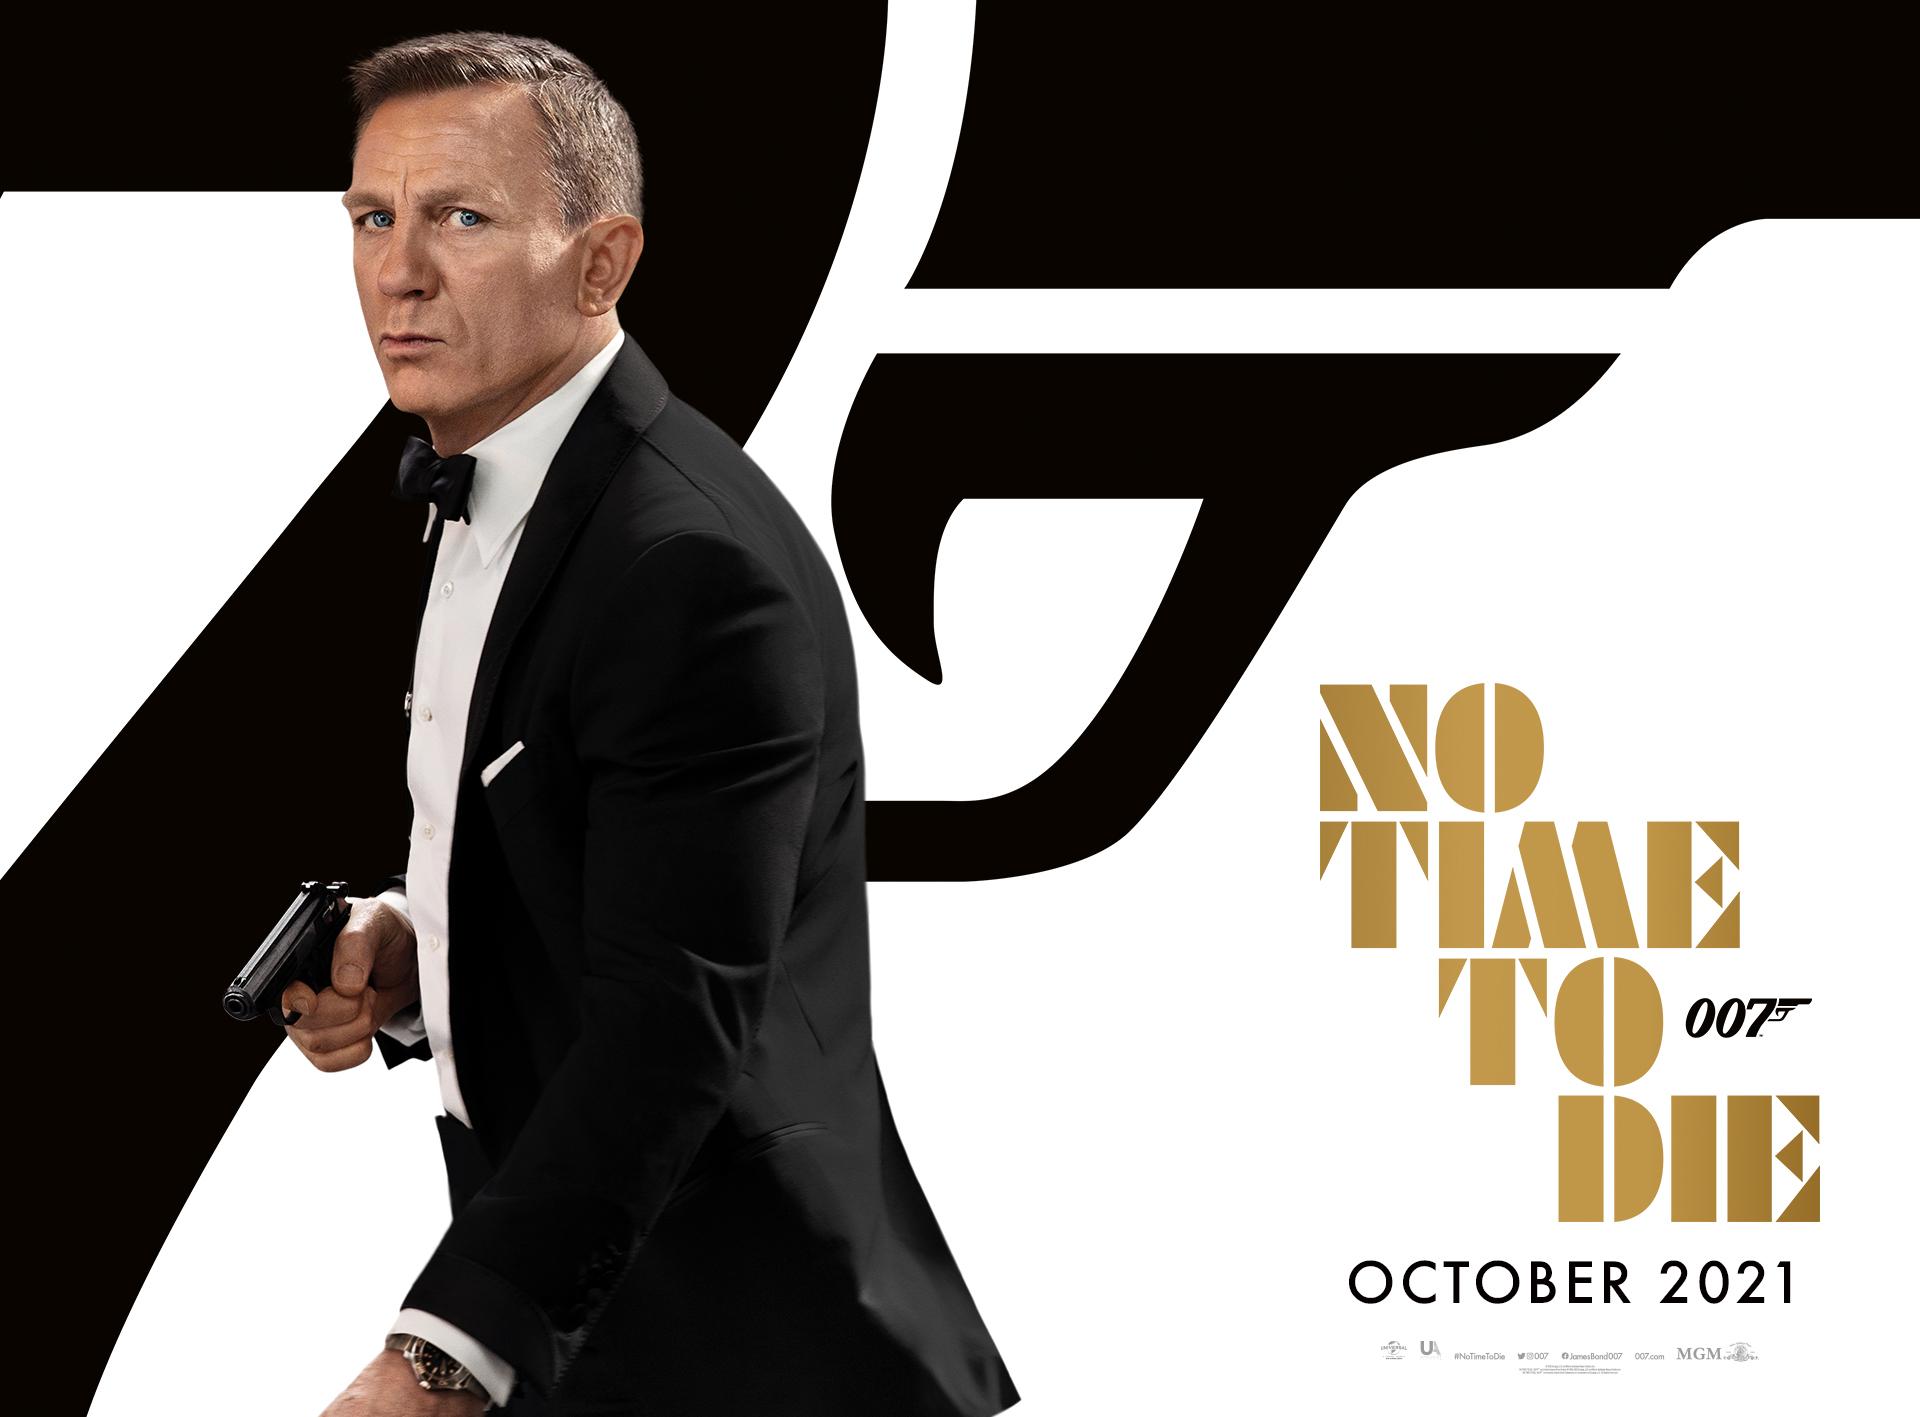 007.com-LS.jpg